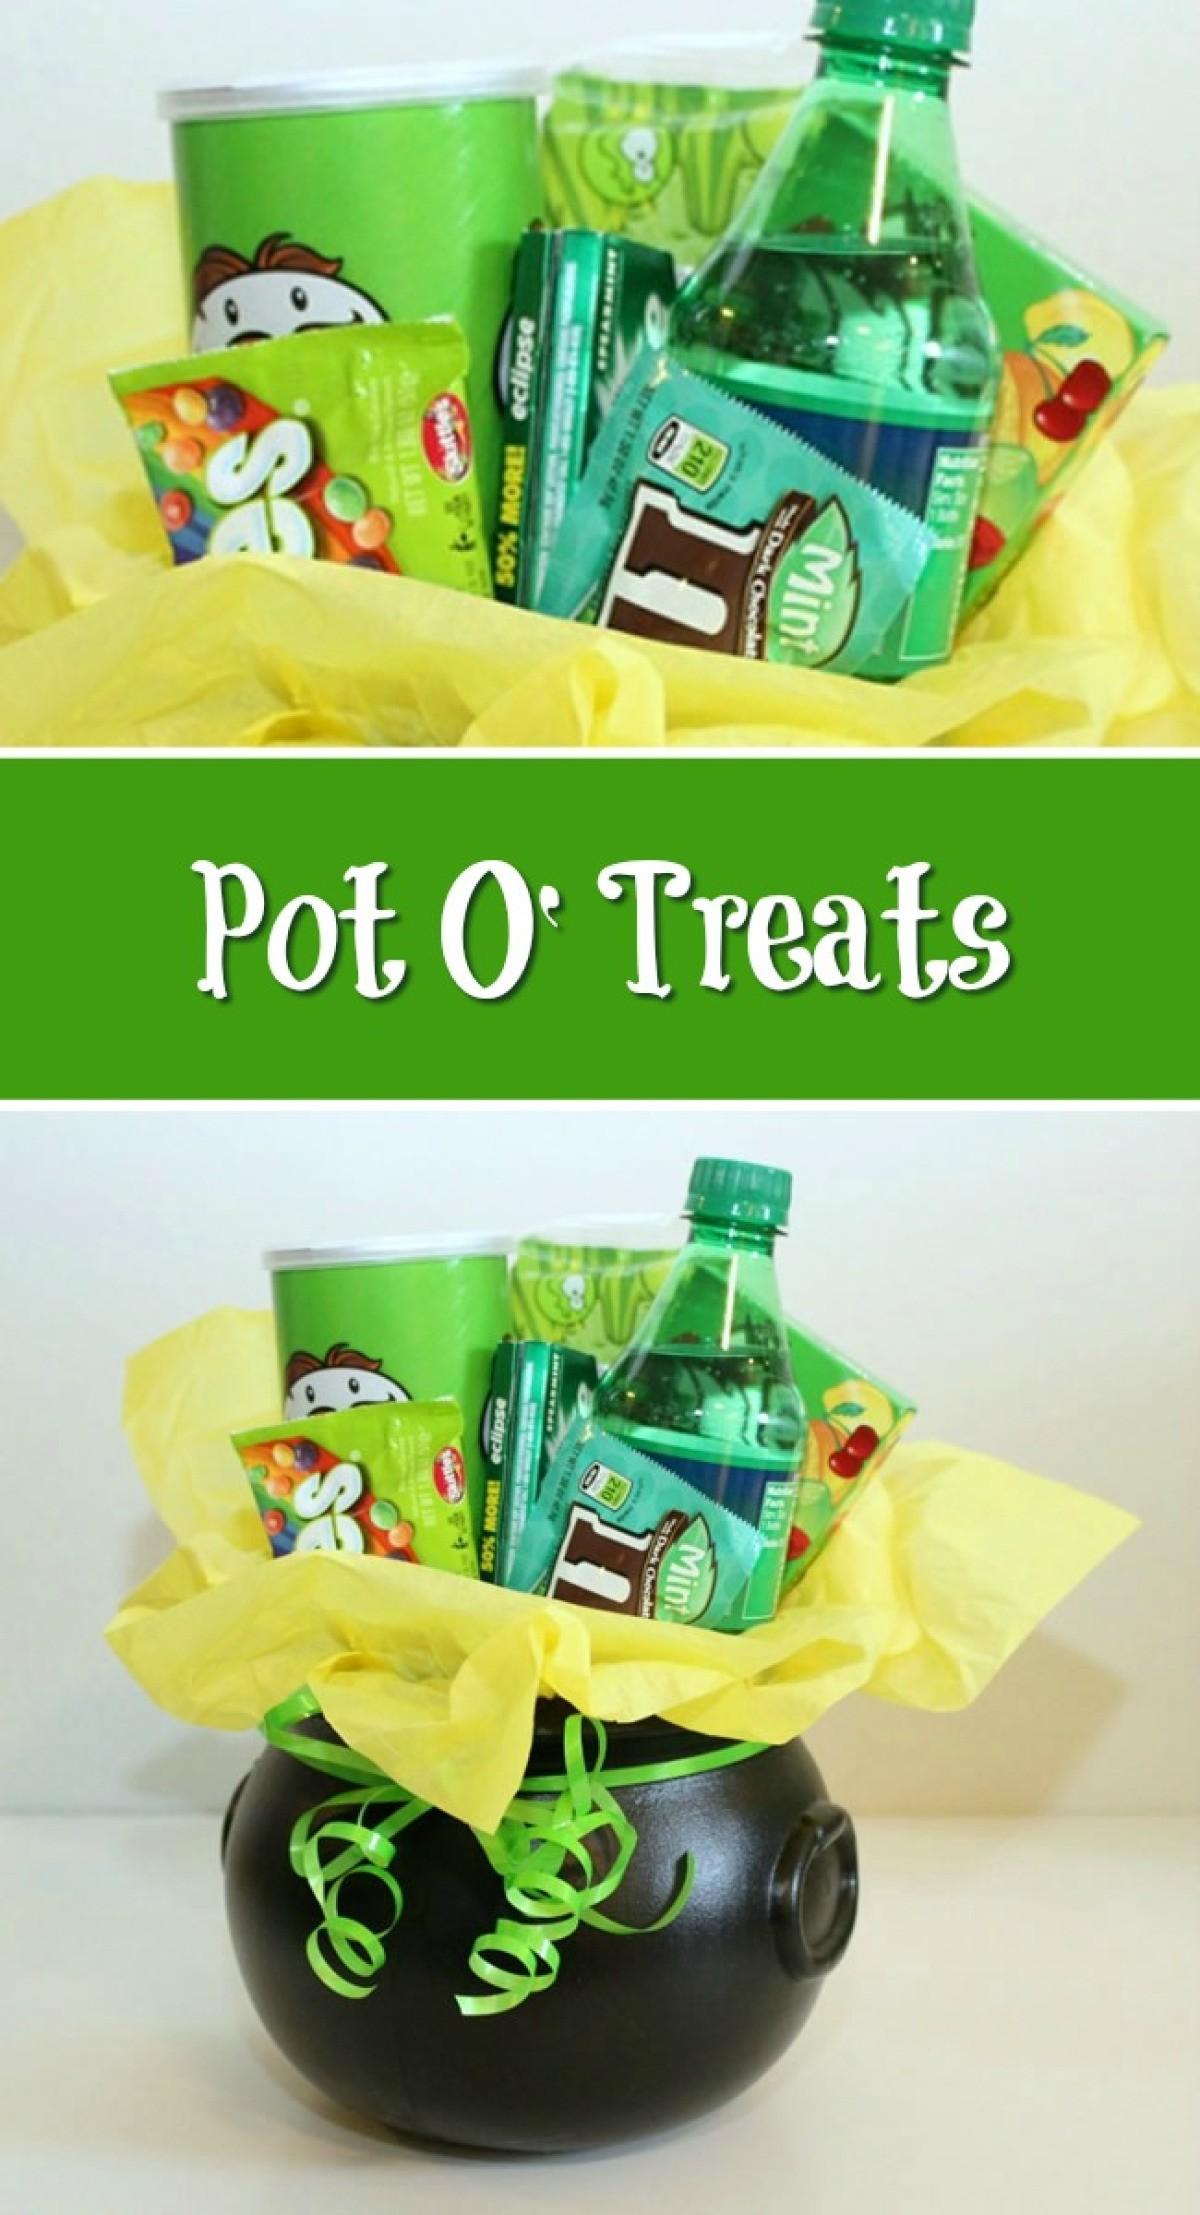 628ff541 Pot O' Treats - St. Patrick's day gift idea with a pot gull of